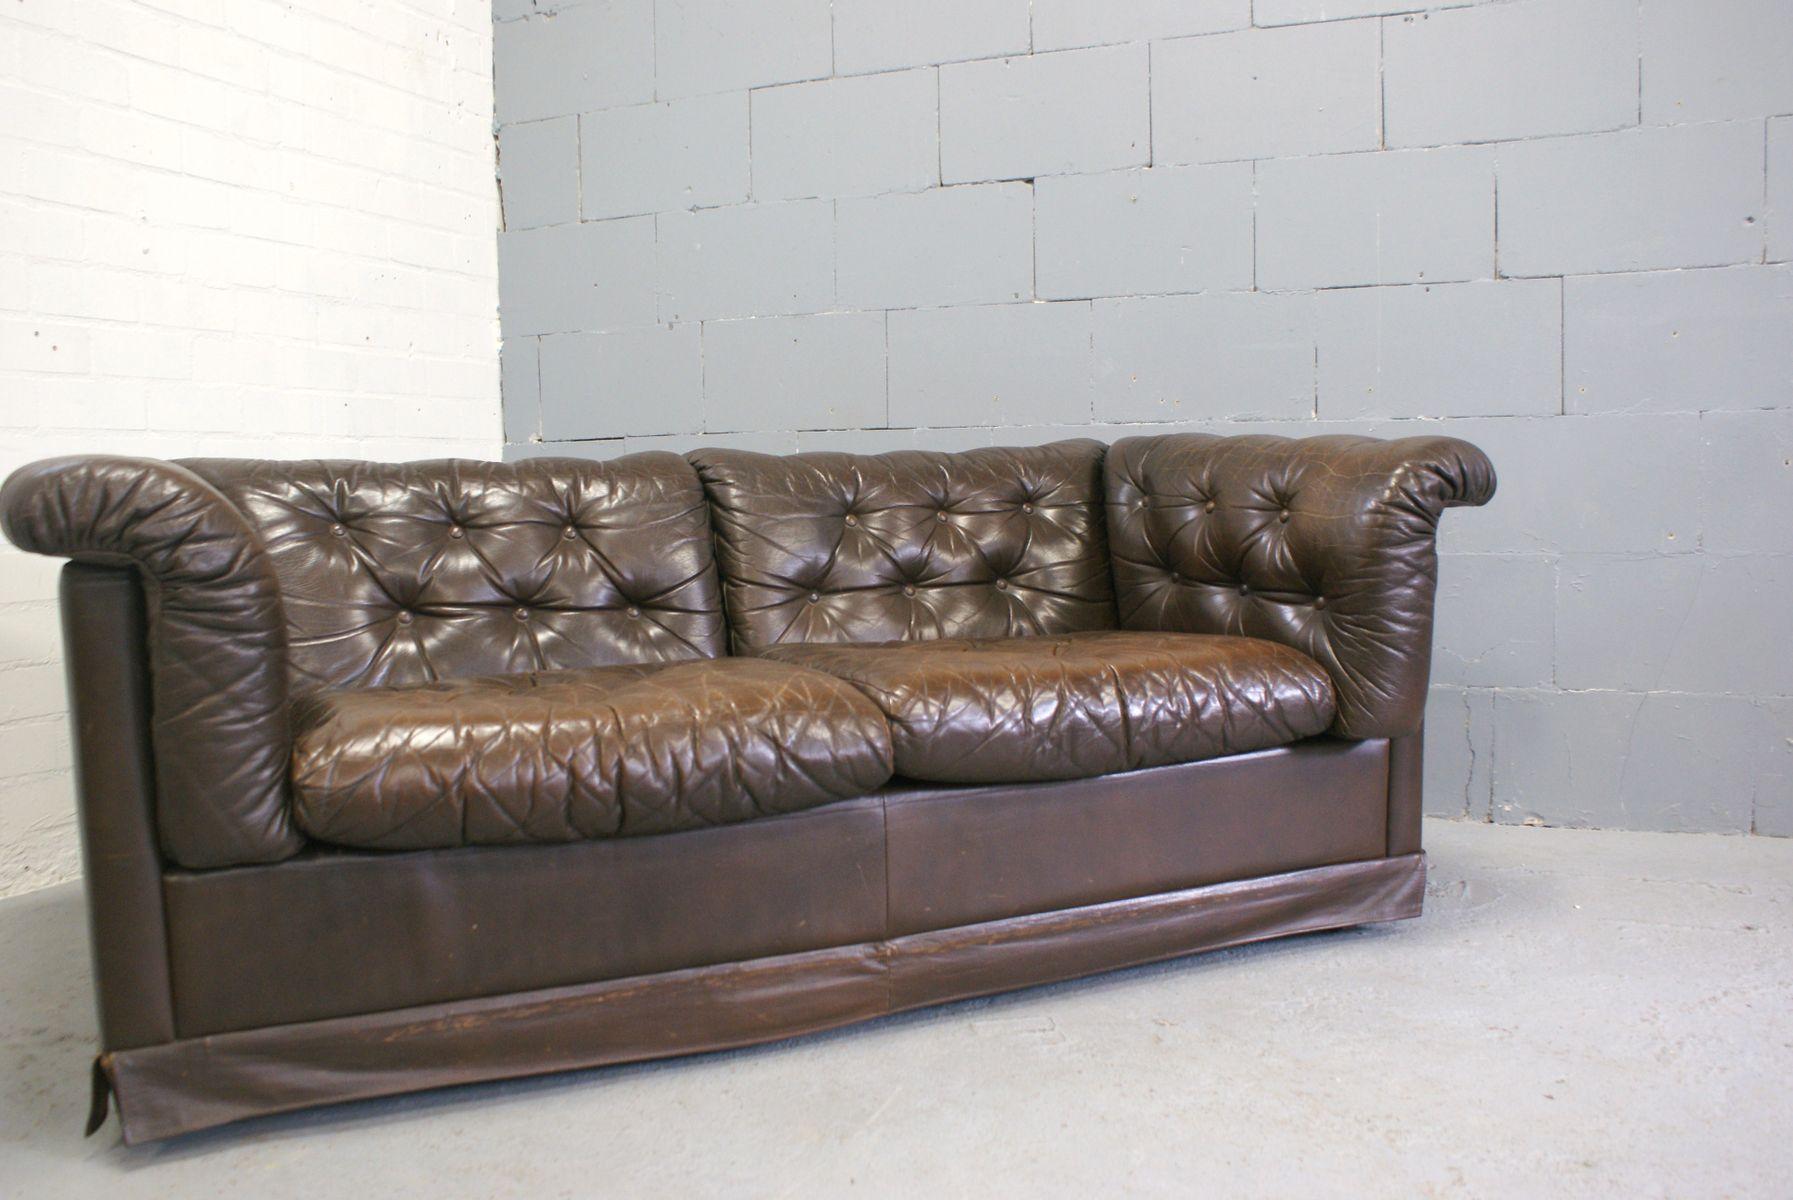 vintage sofa von swed form 1970er bei pamono kaufen. Black Bedroom Furniture Sets. Home Design Ideas